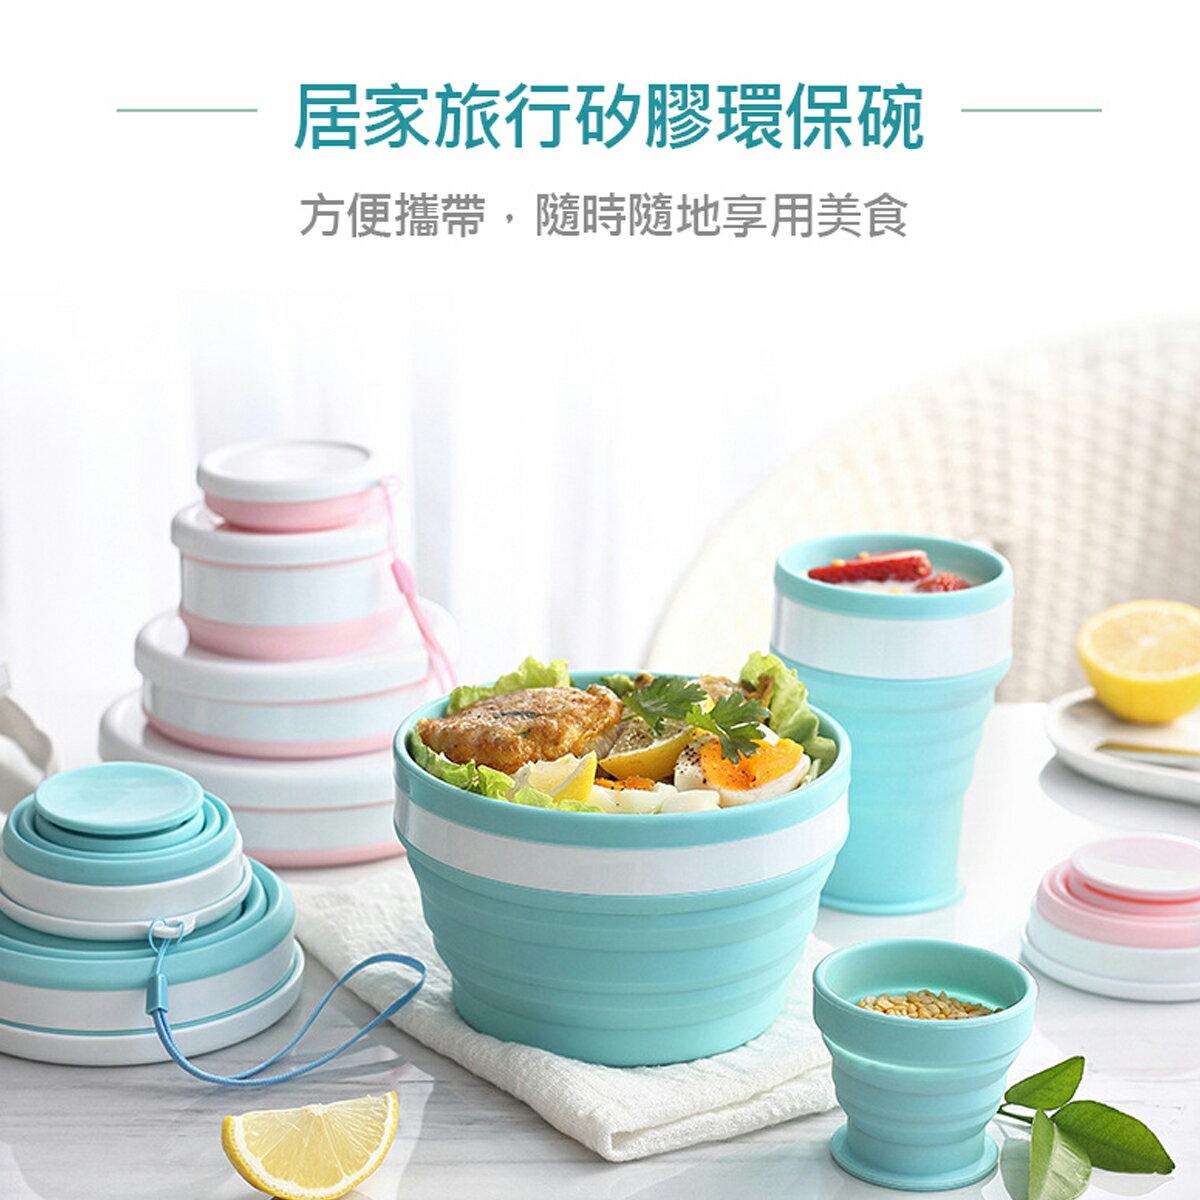 【 CSMART+】環保矽膠摺疊碗&杯 方便攜帶水杯碗 可折疊 可伸縮 不占空間 好清洗 耐高溫